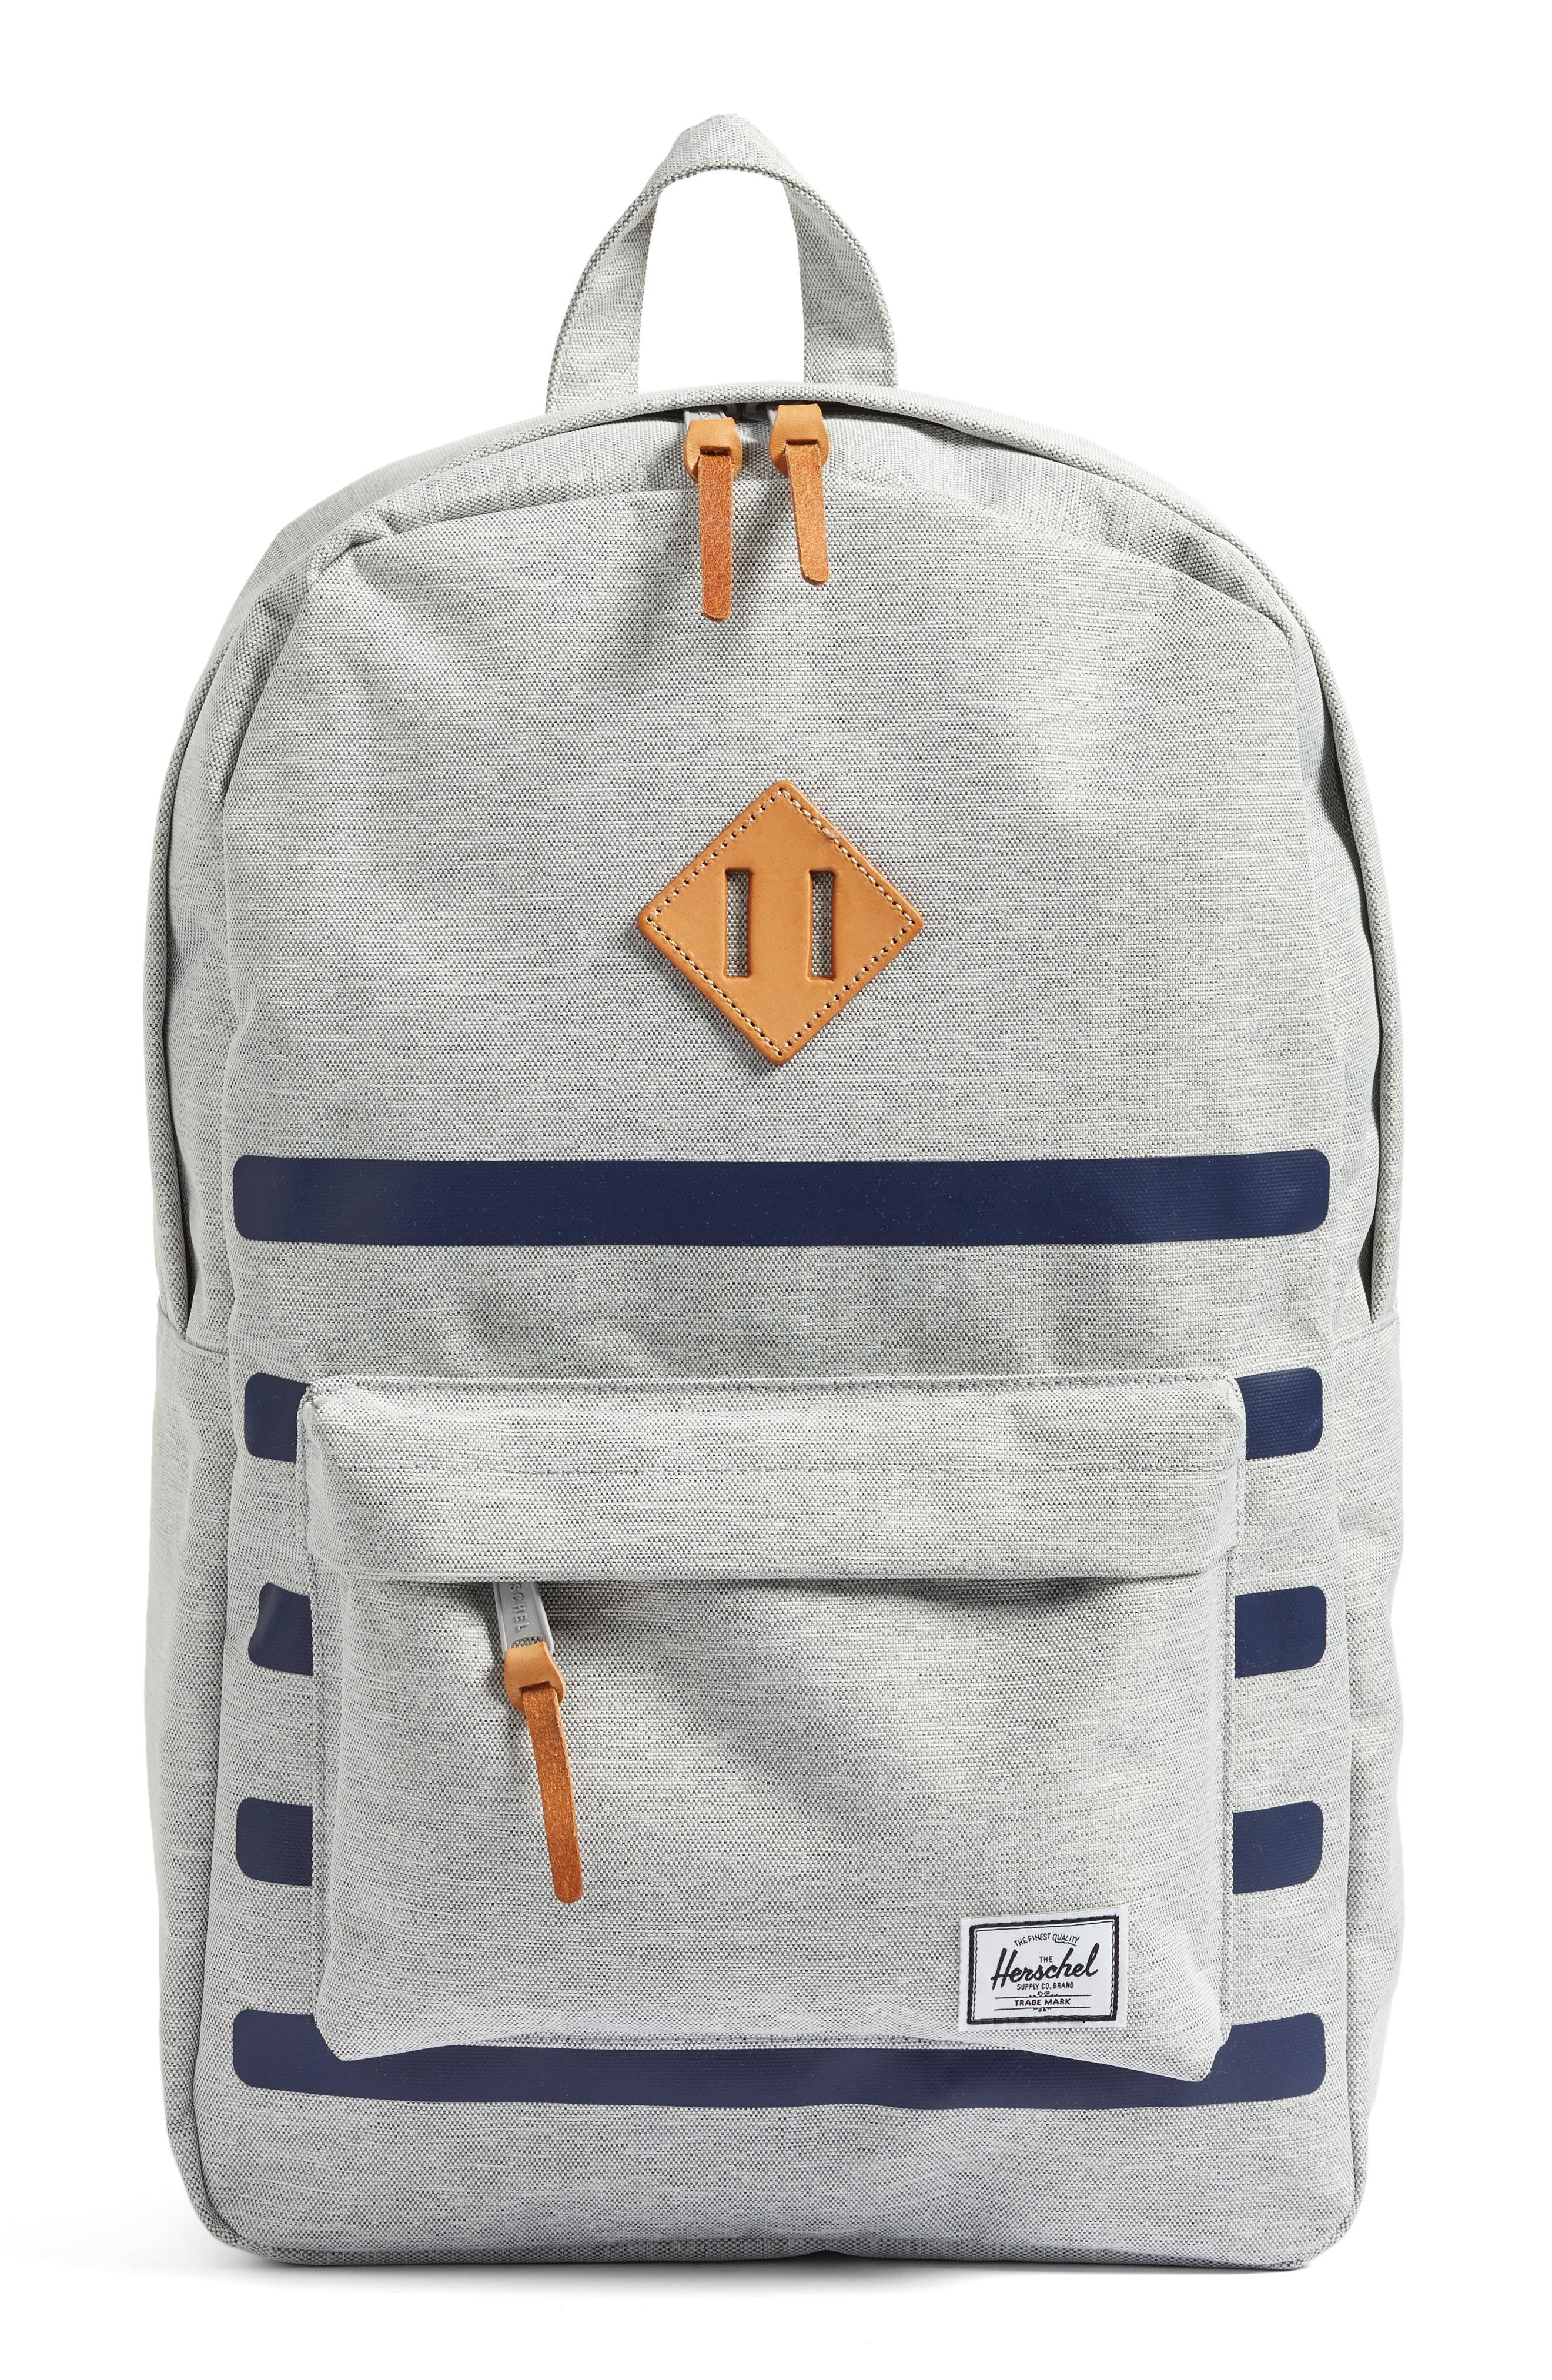 Main Image - Herschel Supply Co. Heritage Offset Backpack